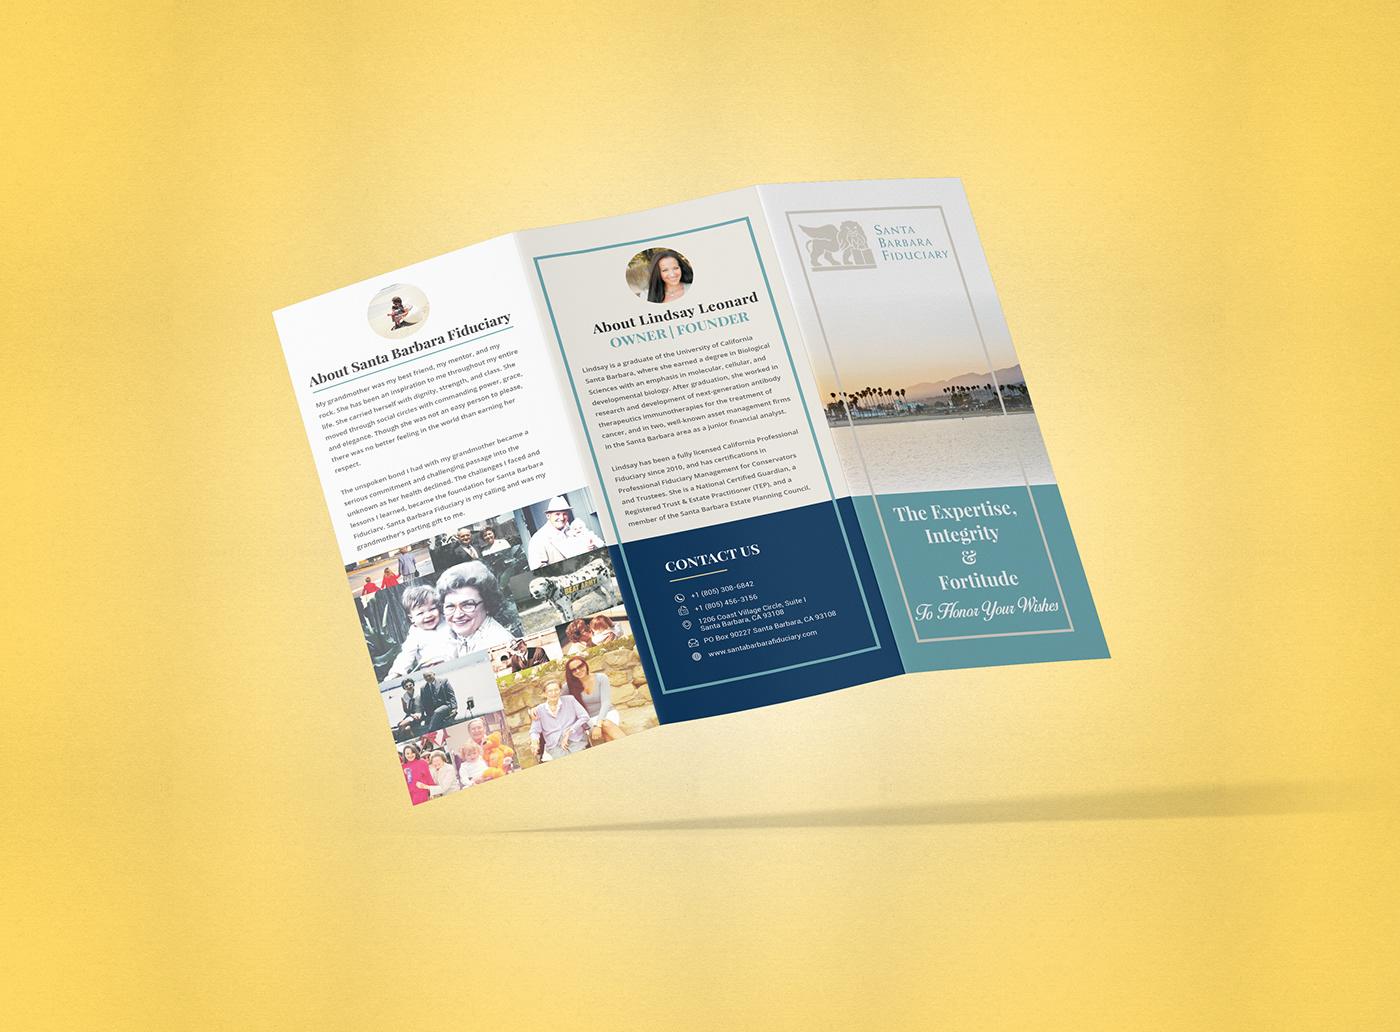 Santa Barbara Fiduciary Brochure Design on Behance